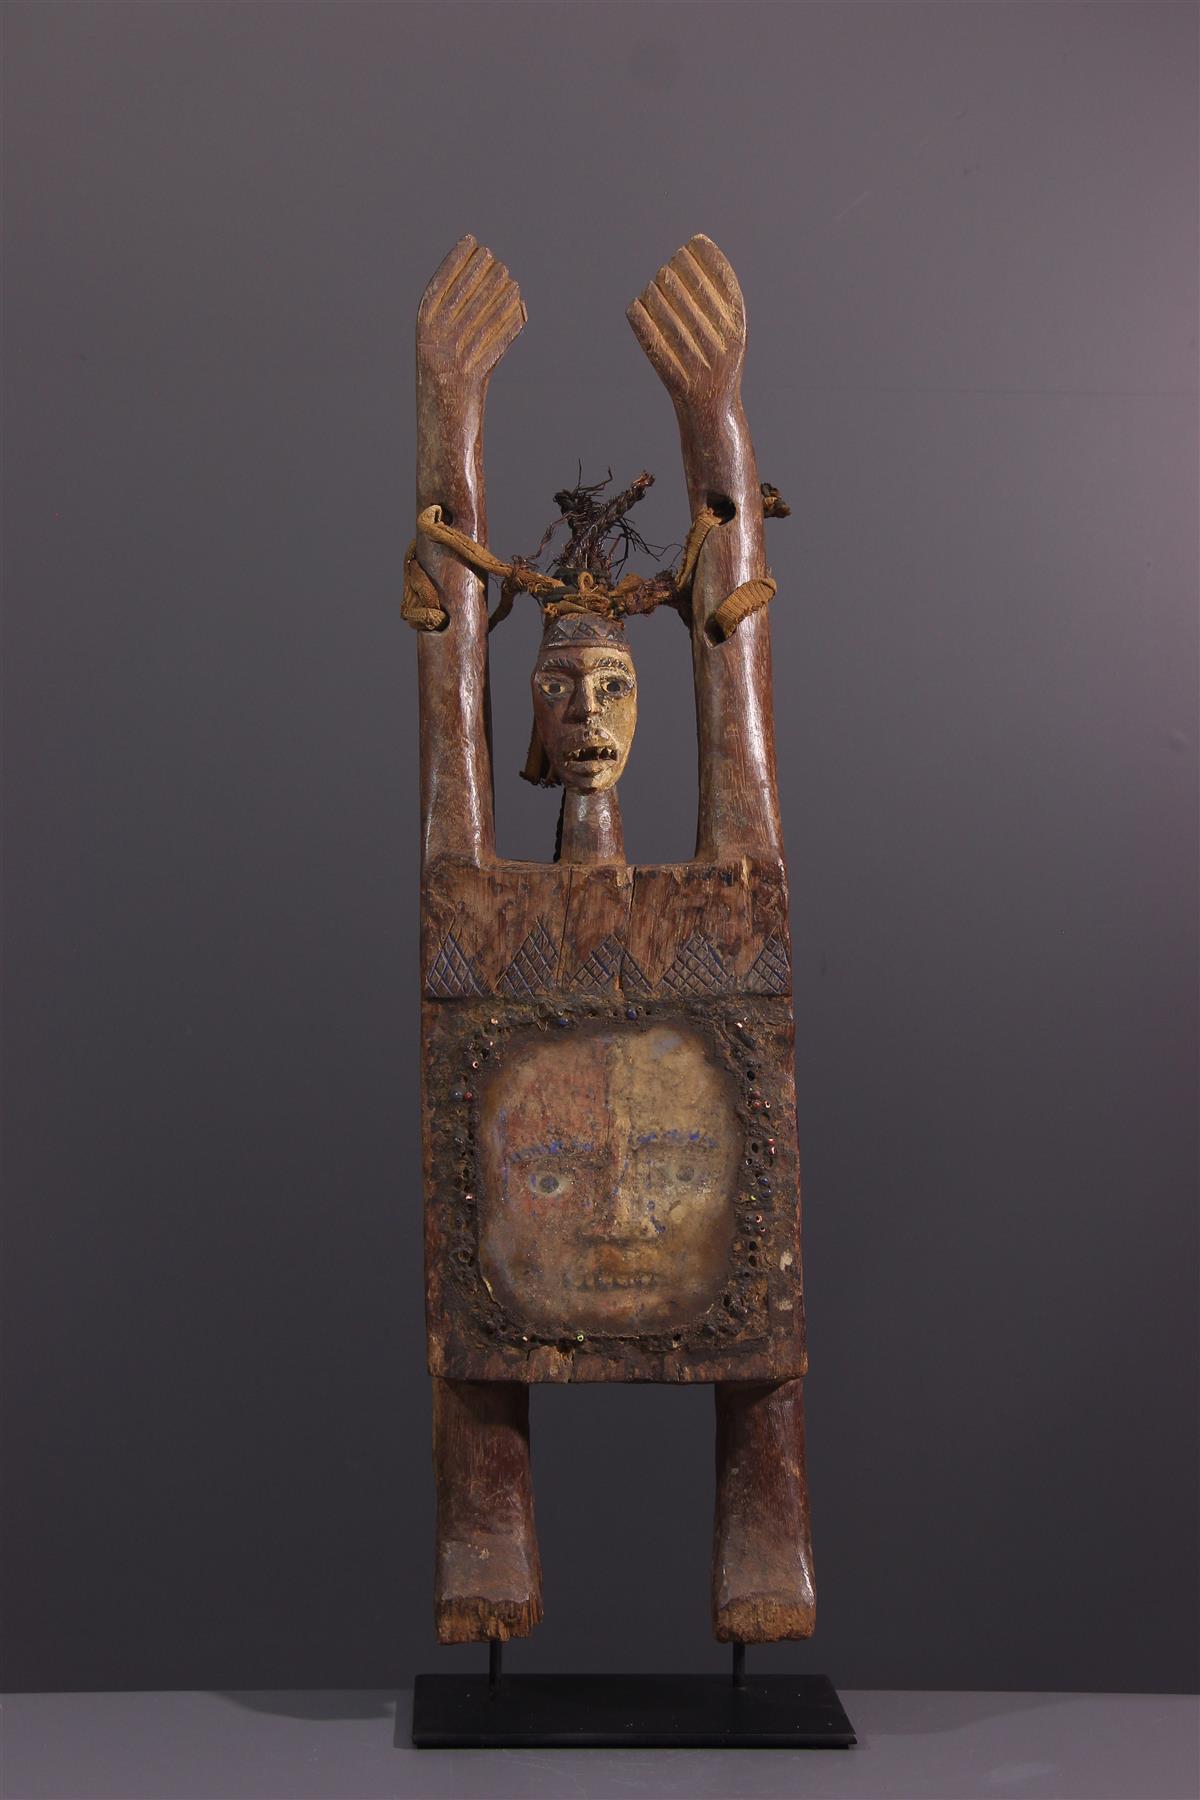 Statue of Congo - Tribal art